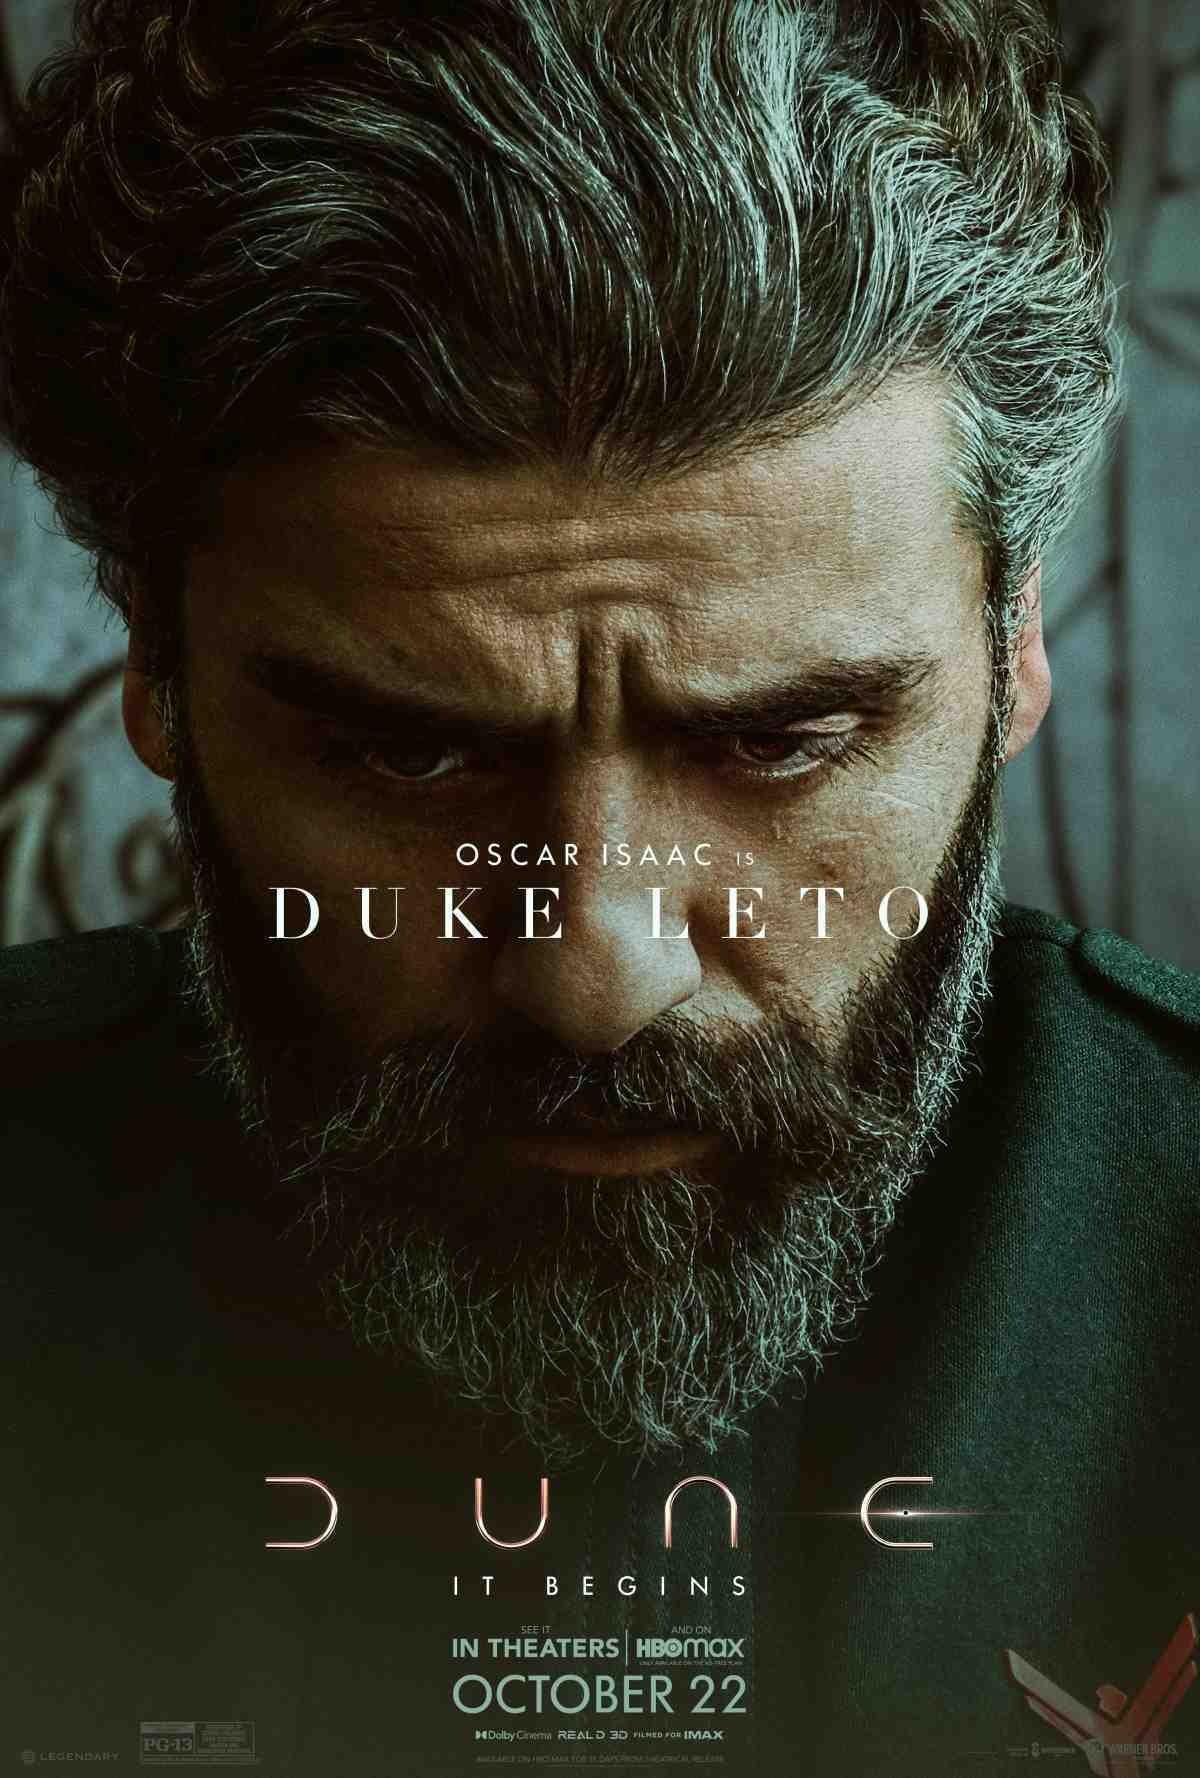 Oscar Isaac as Duke Leto Atreides in 'Dune'